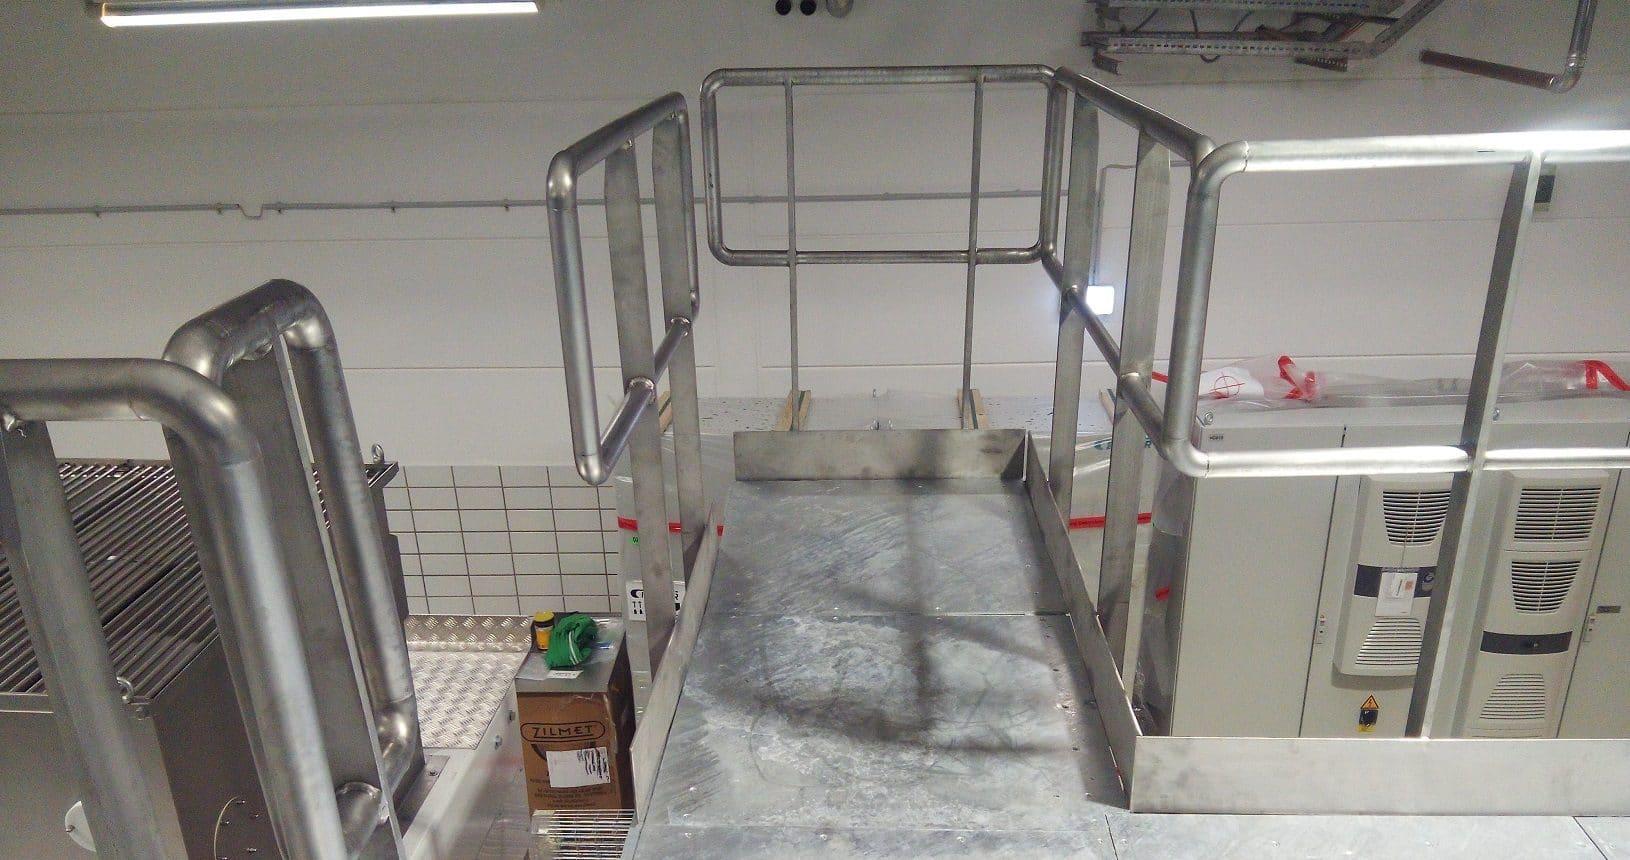 Stahlbühne Lebensmittelproduktion